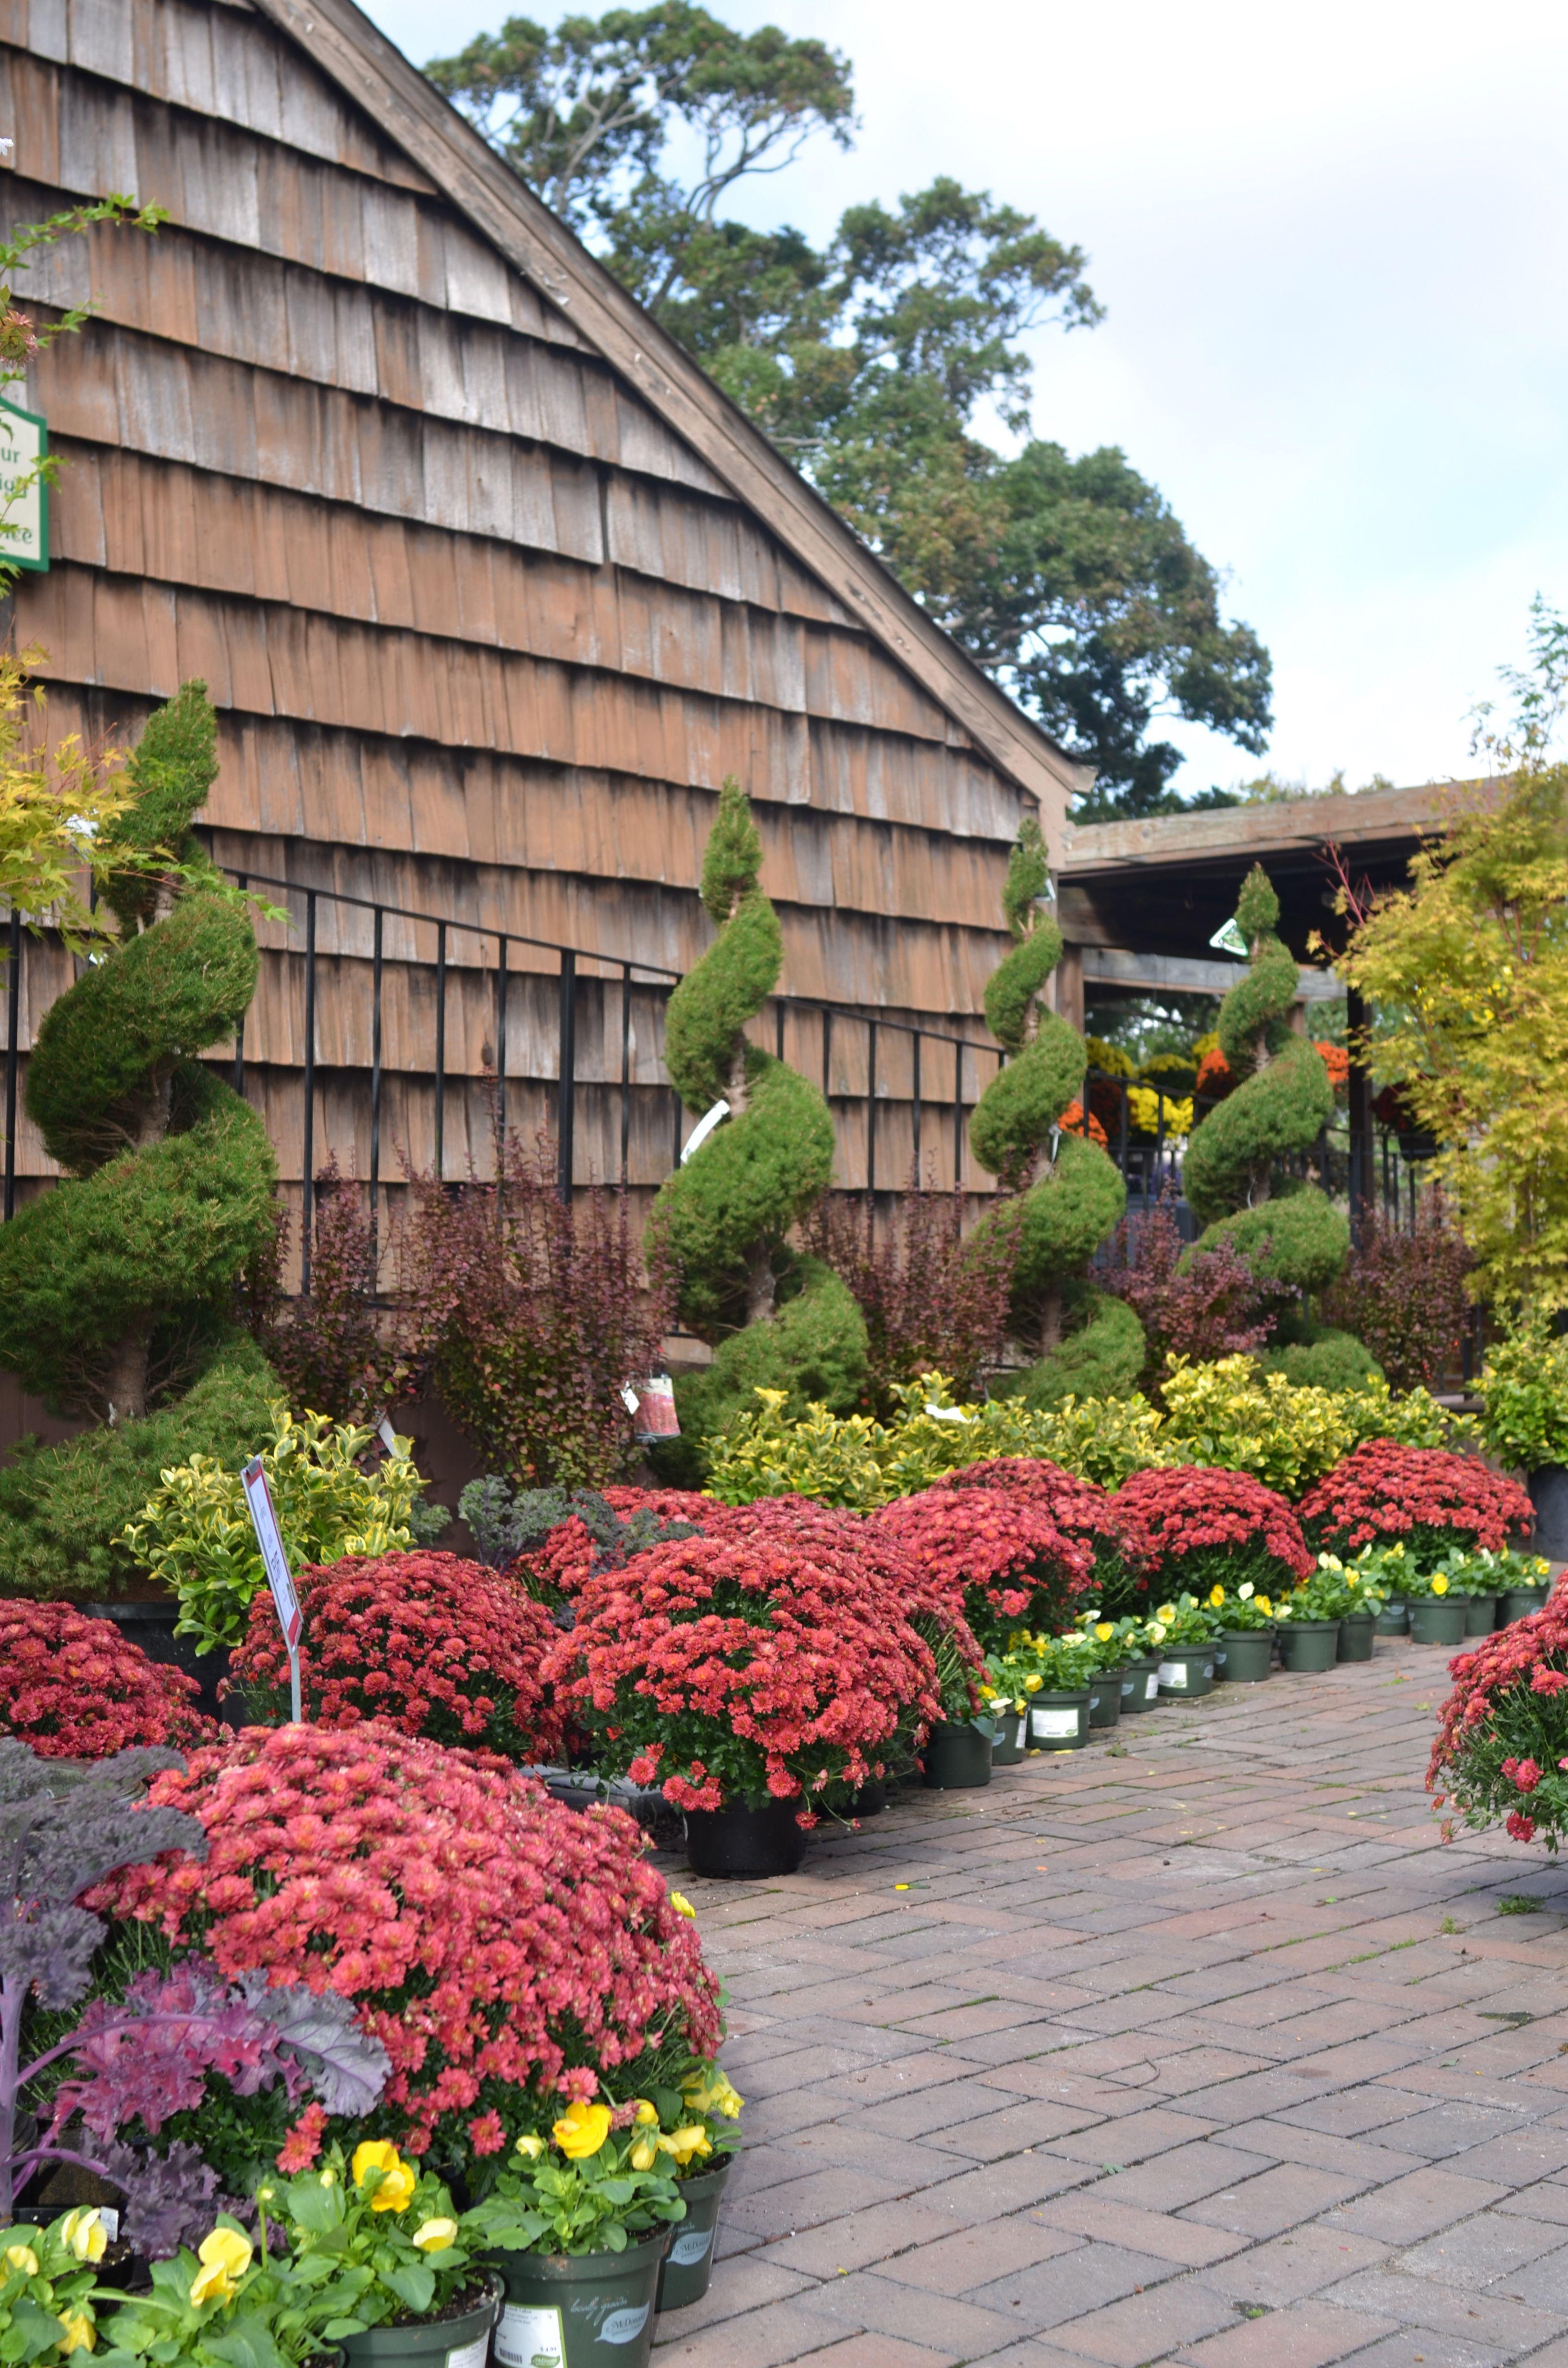 Merveilleux Fall Plants McDonald Garden Center, Virginia Beach